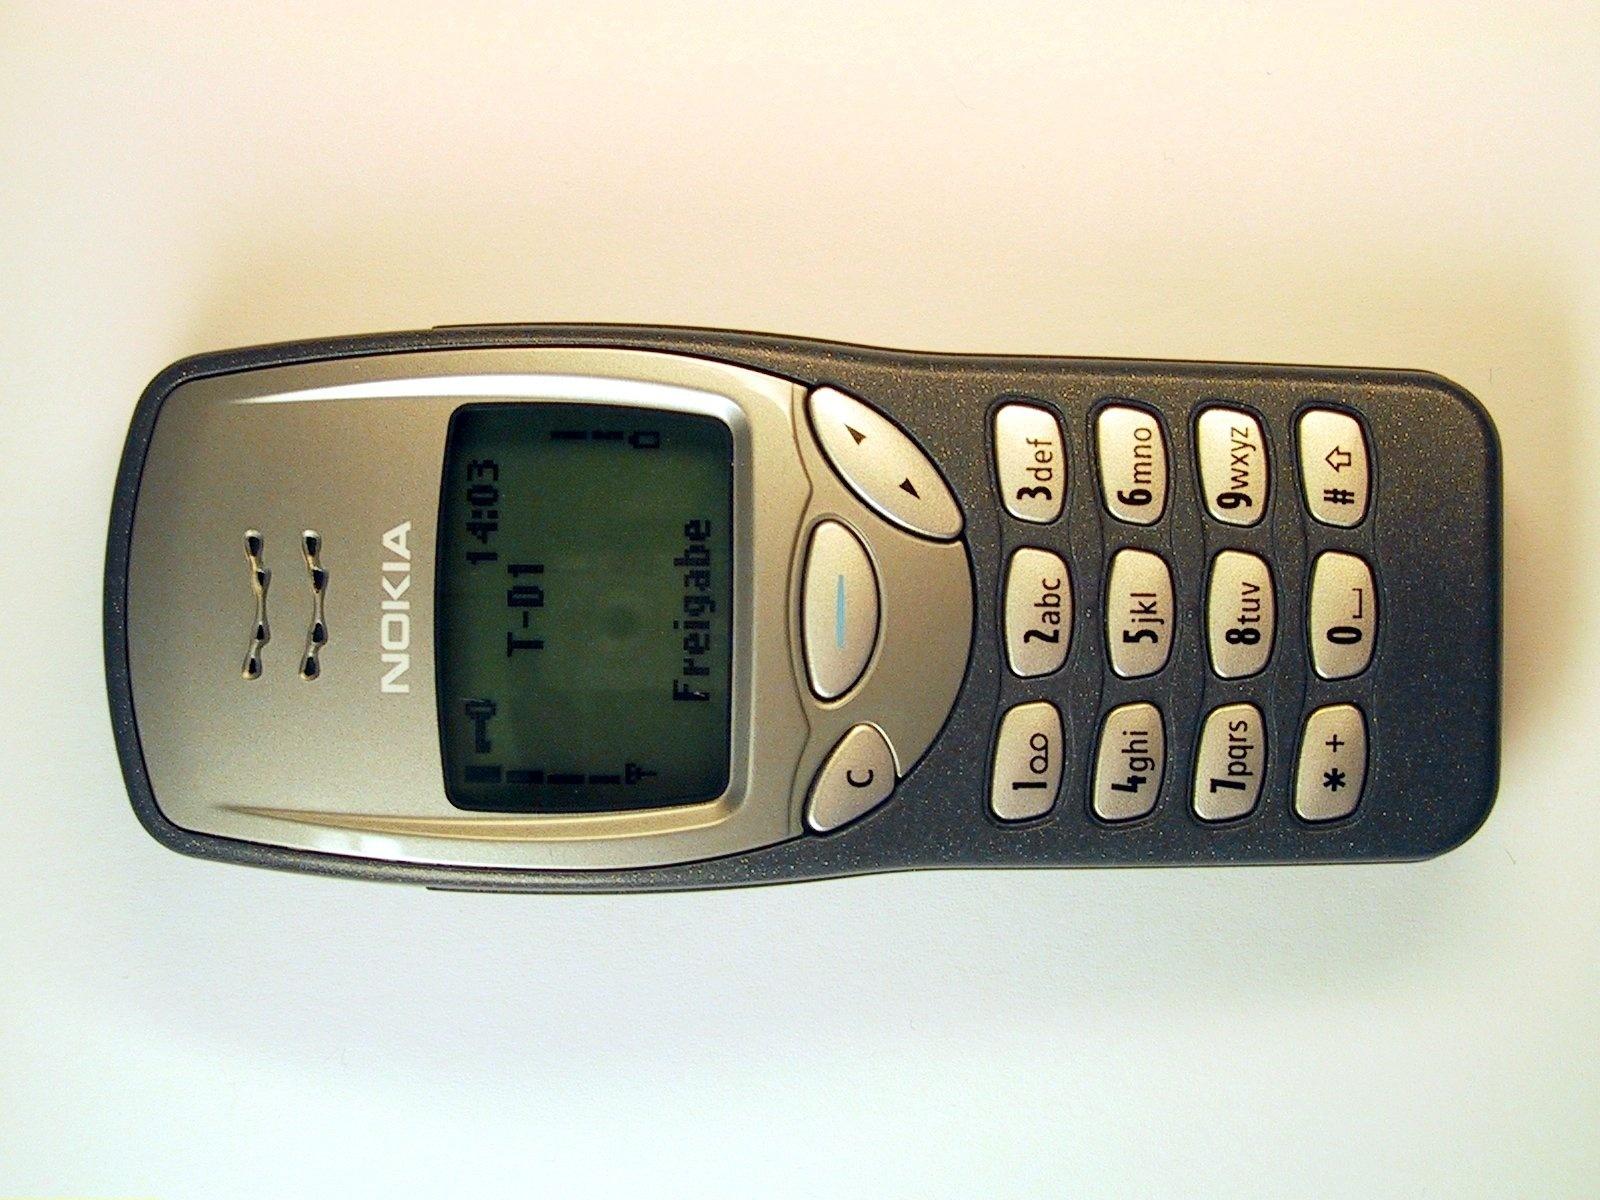 Nokia 3210 / Handy